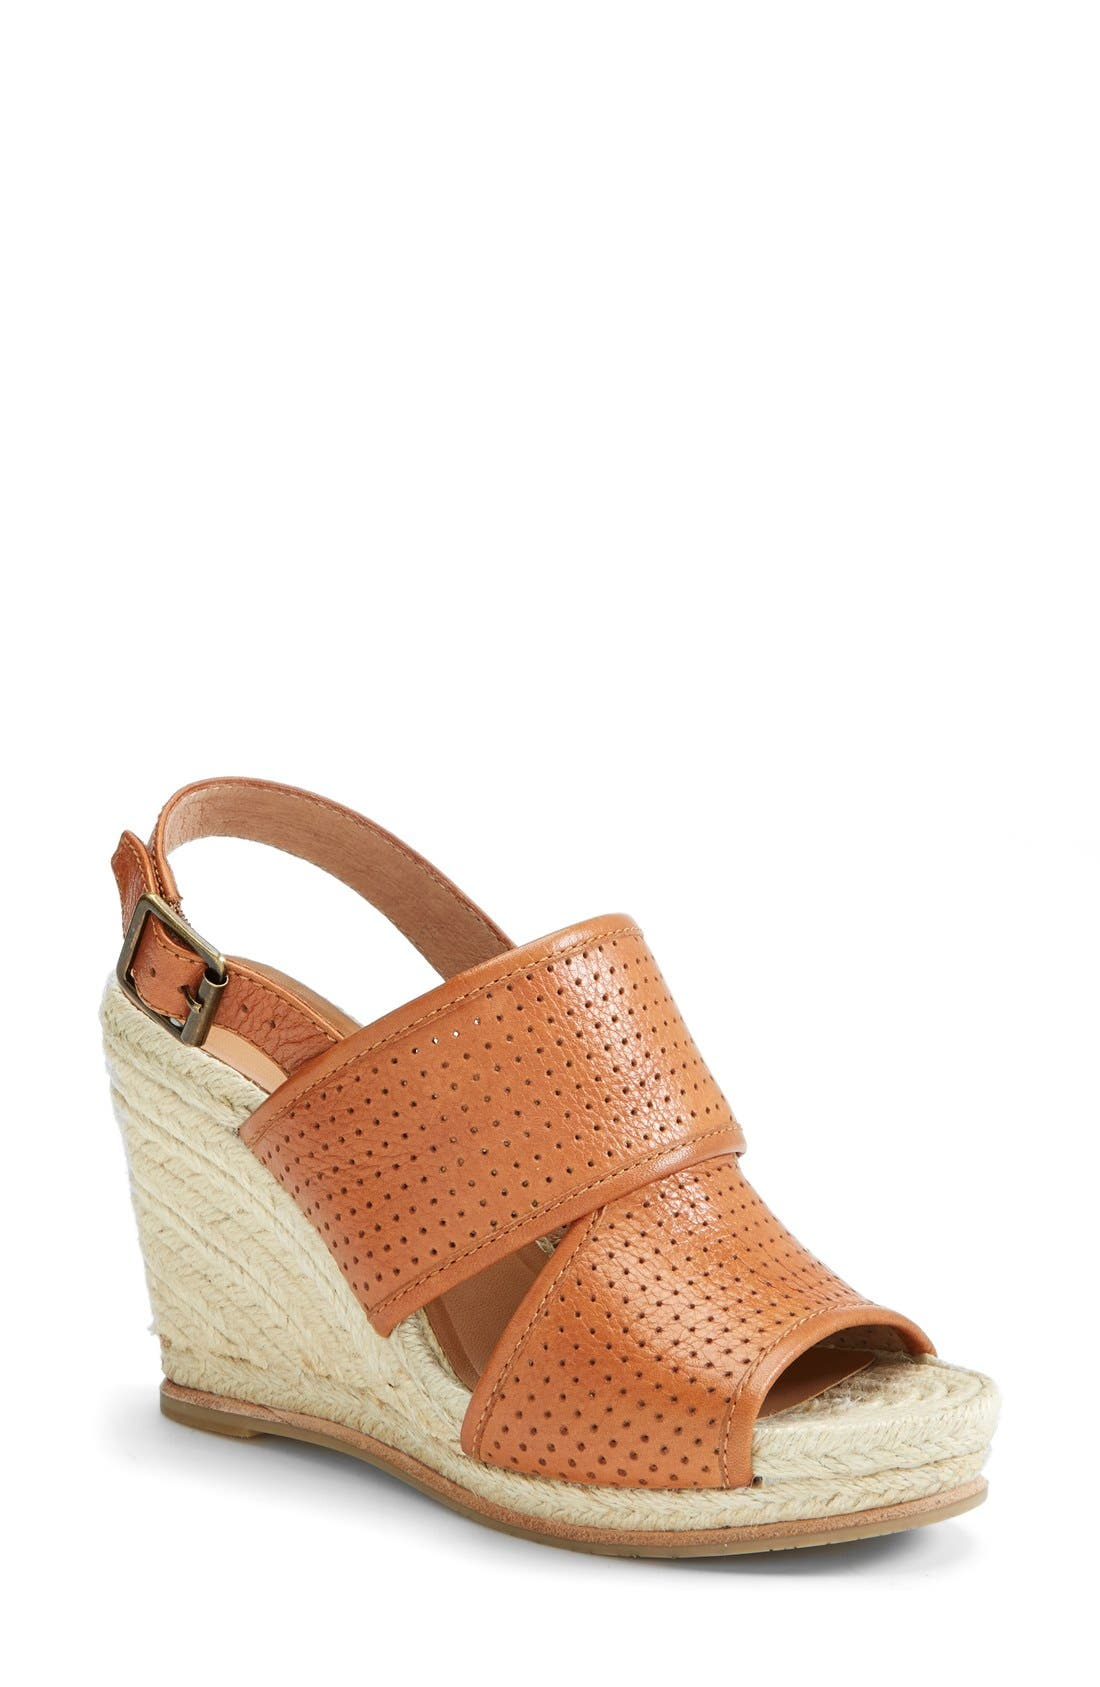 'Joyce' Perforated Espadrille Wedge Sandal,                         Main,                         color, Brown